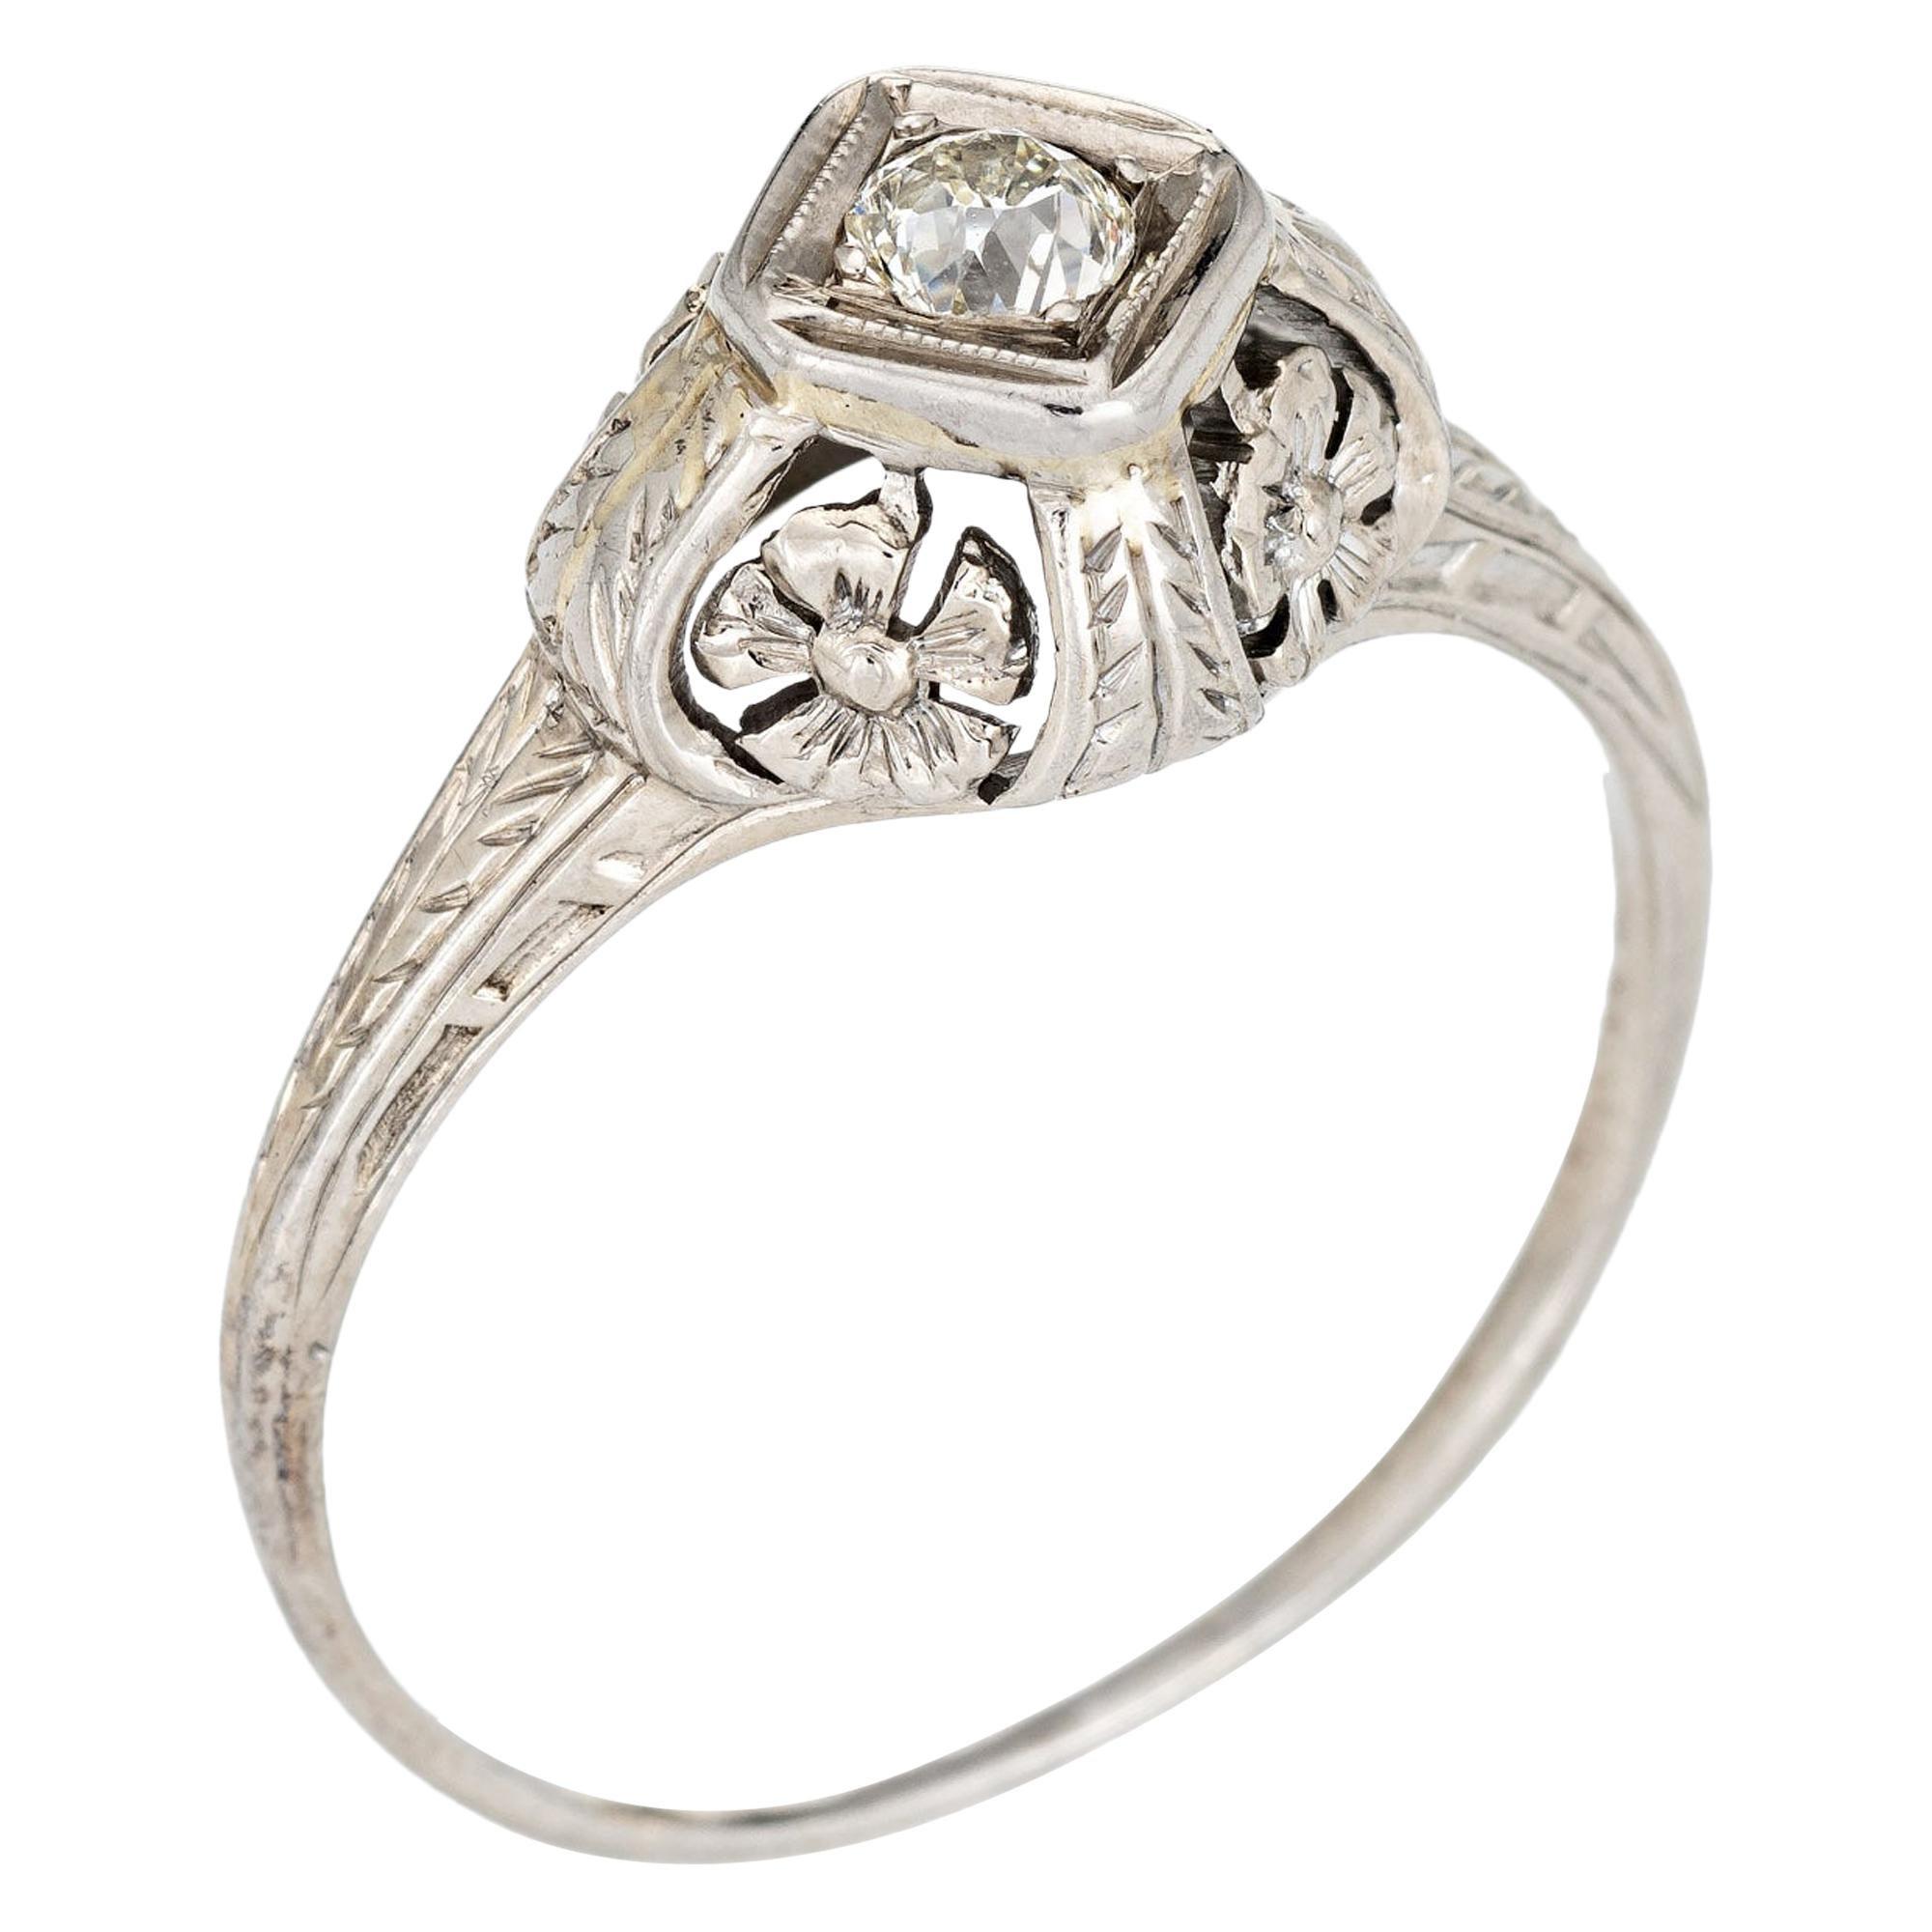 Vintage Art Deco Diamond Ring 14 Karat White Gold Filigree Estate Fine Jewelry